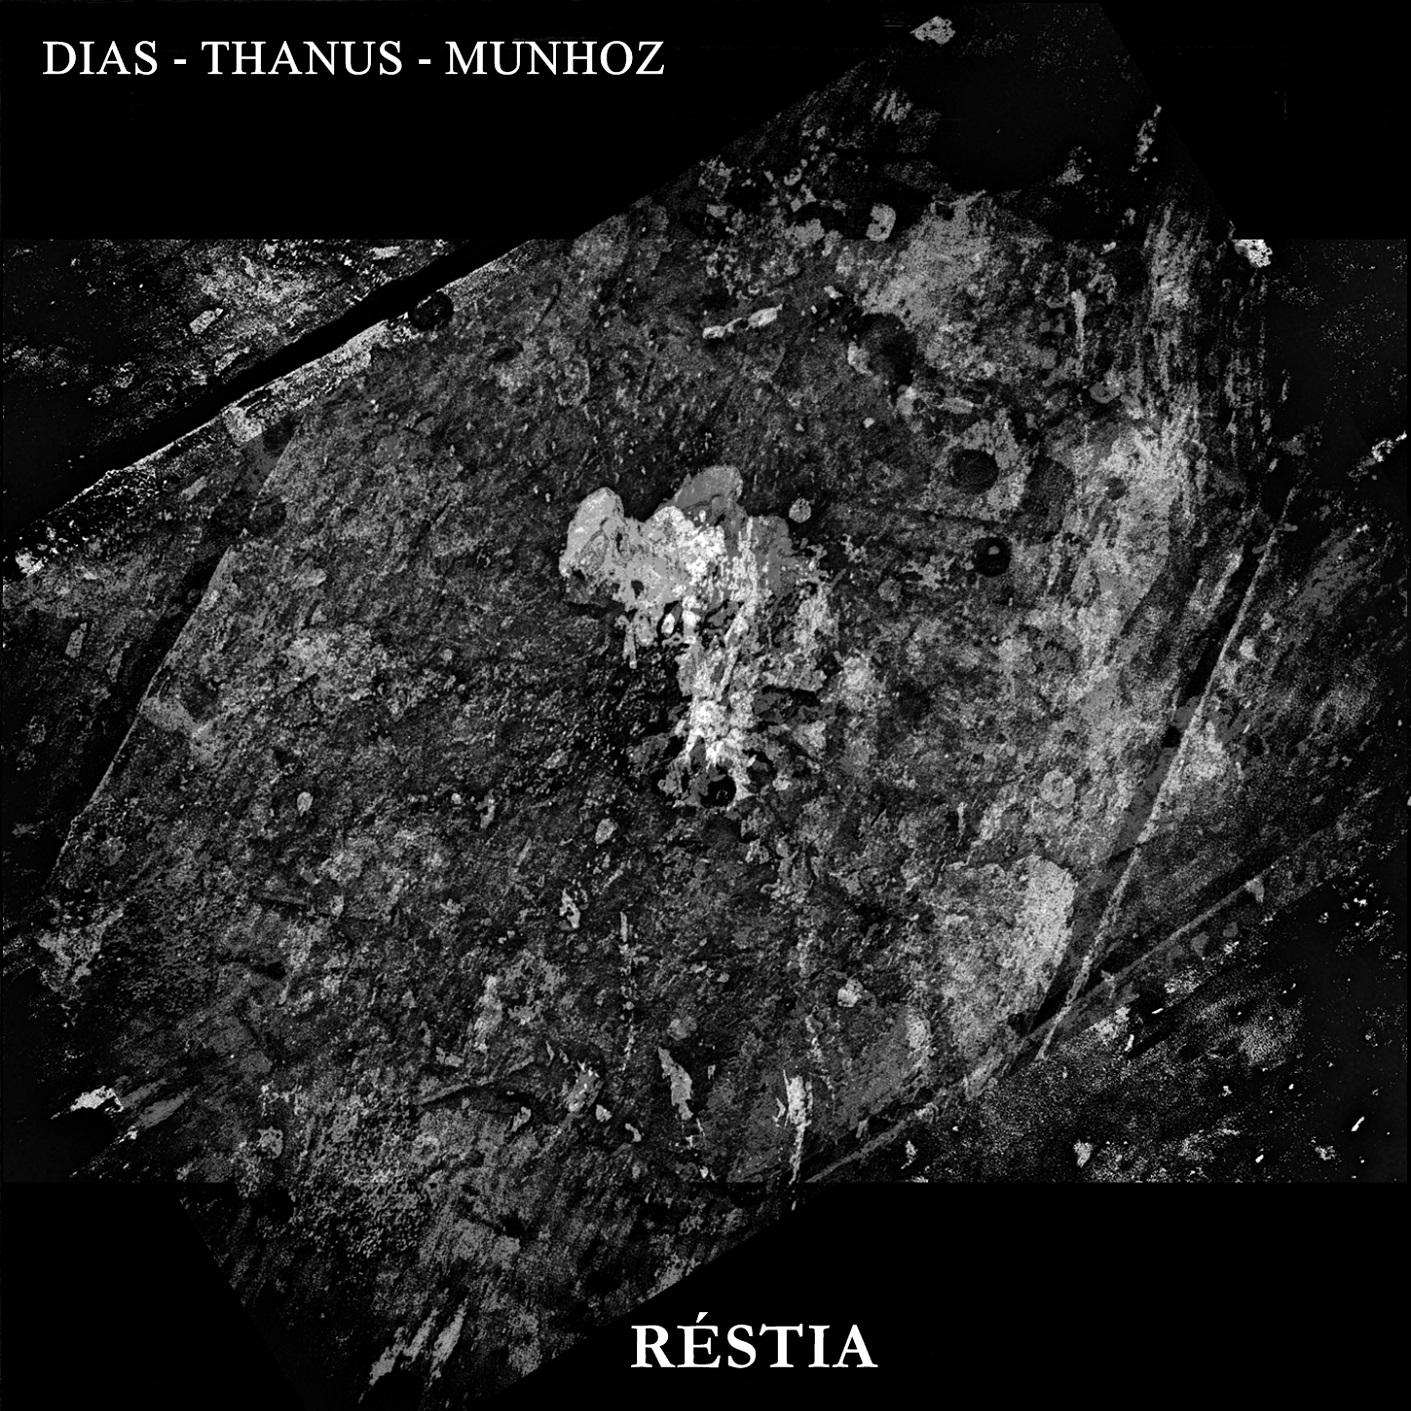 MSRCD082 - Dias/Thanus/Munhoz - Réstia